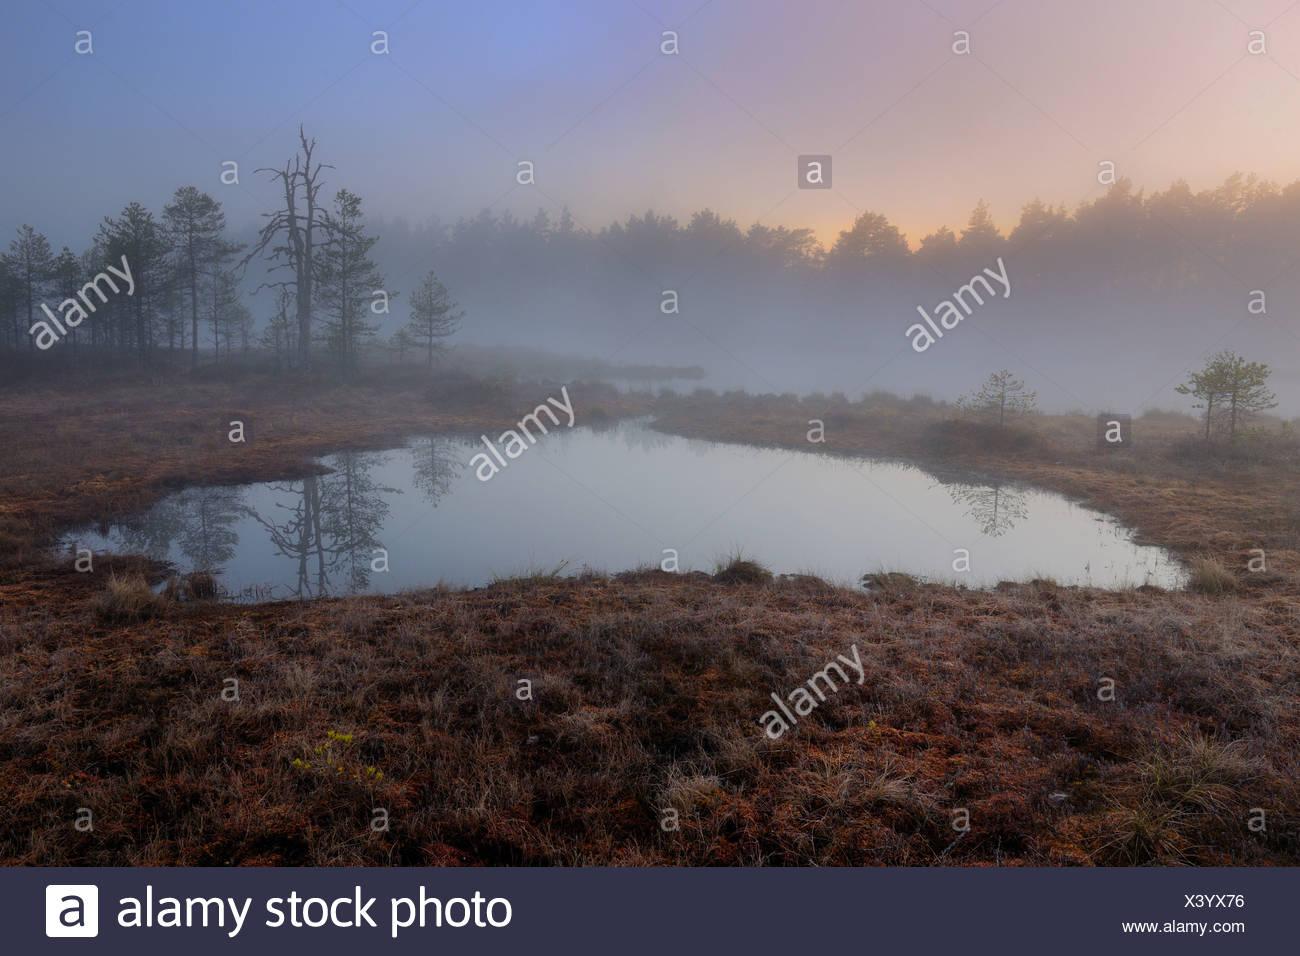 Swamp at dawn, early morning, Dalarna, Sweden, Scandinavia, Europe - Stock Image